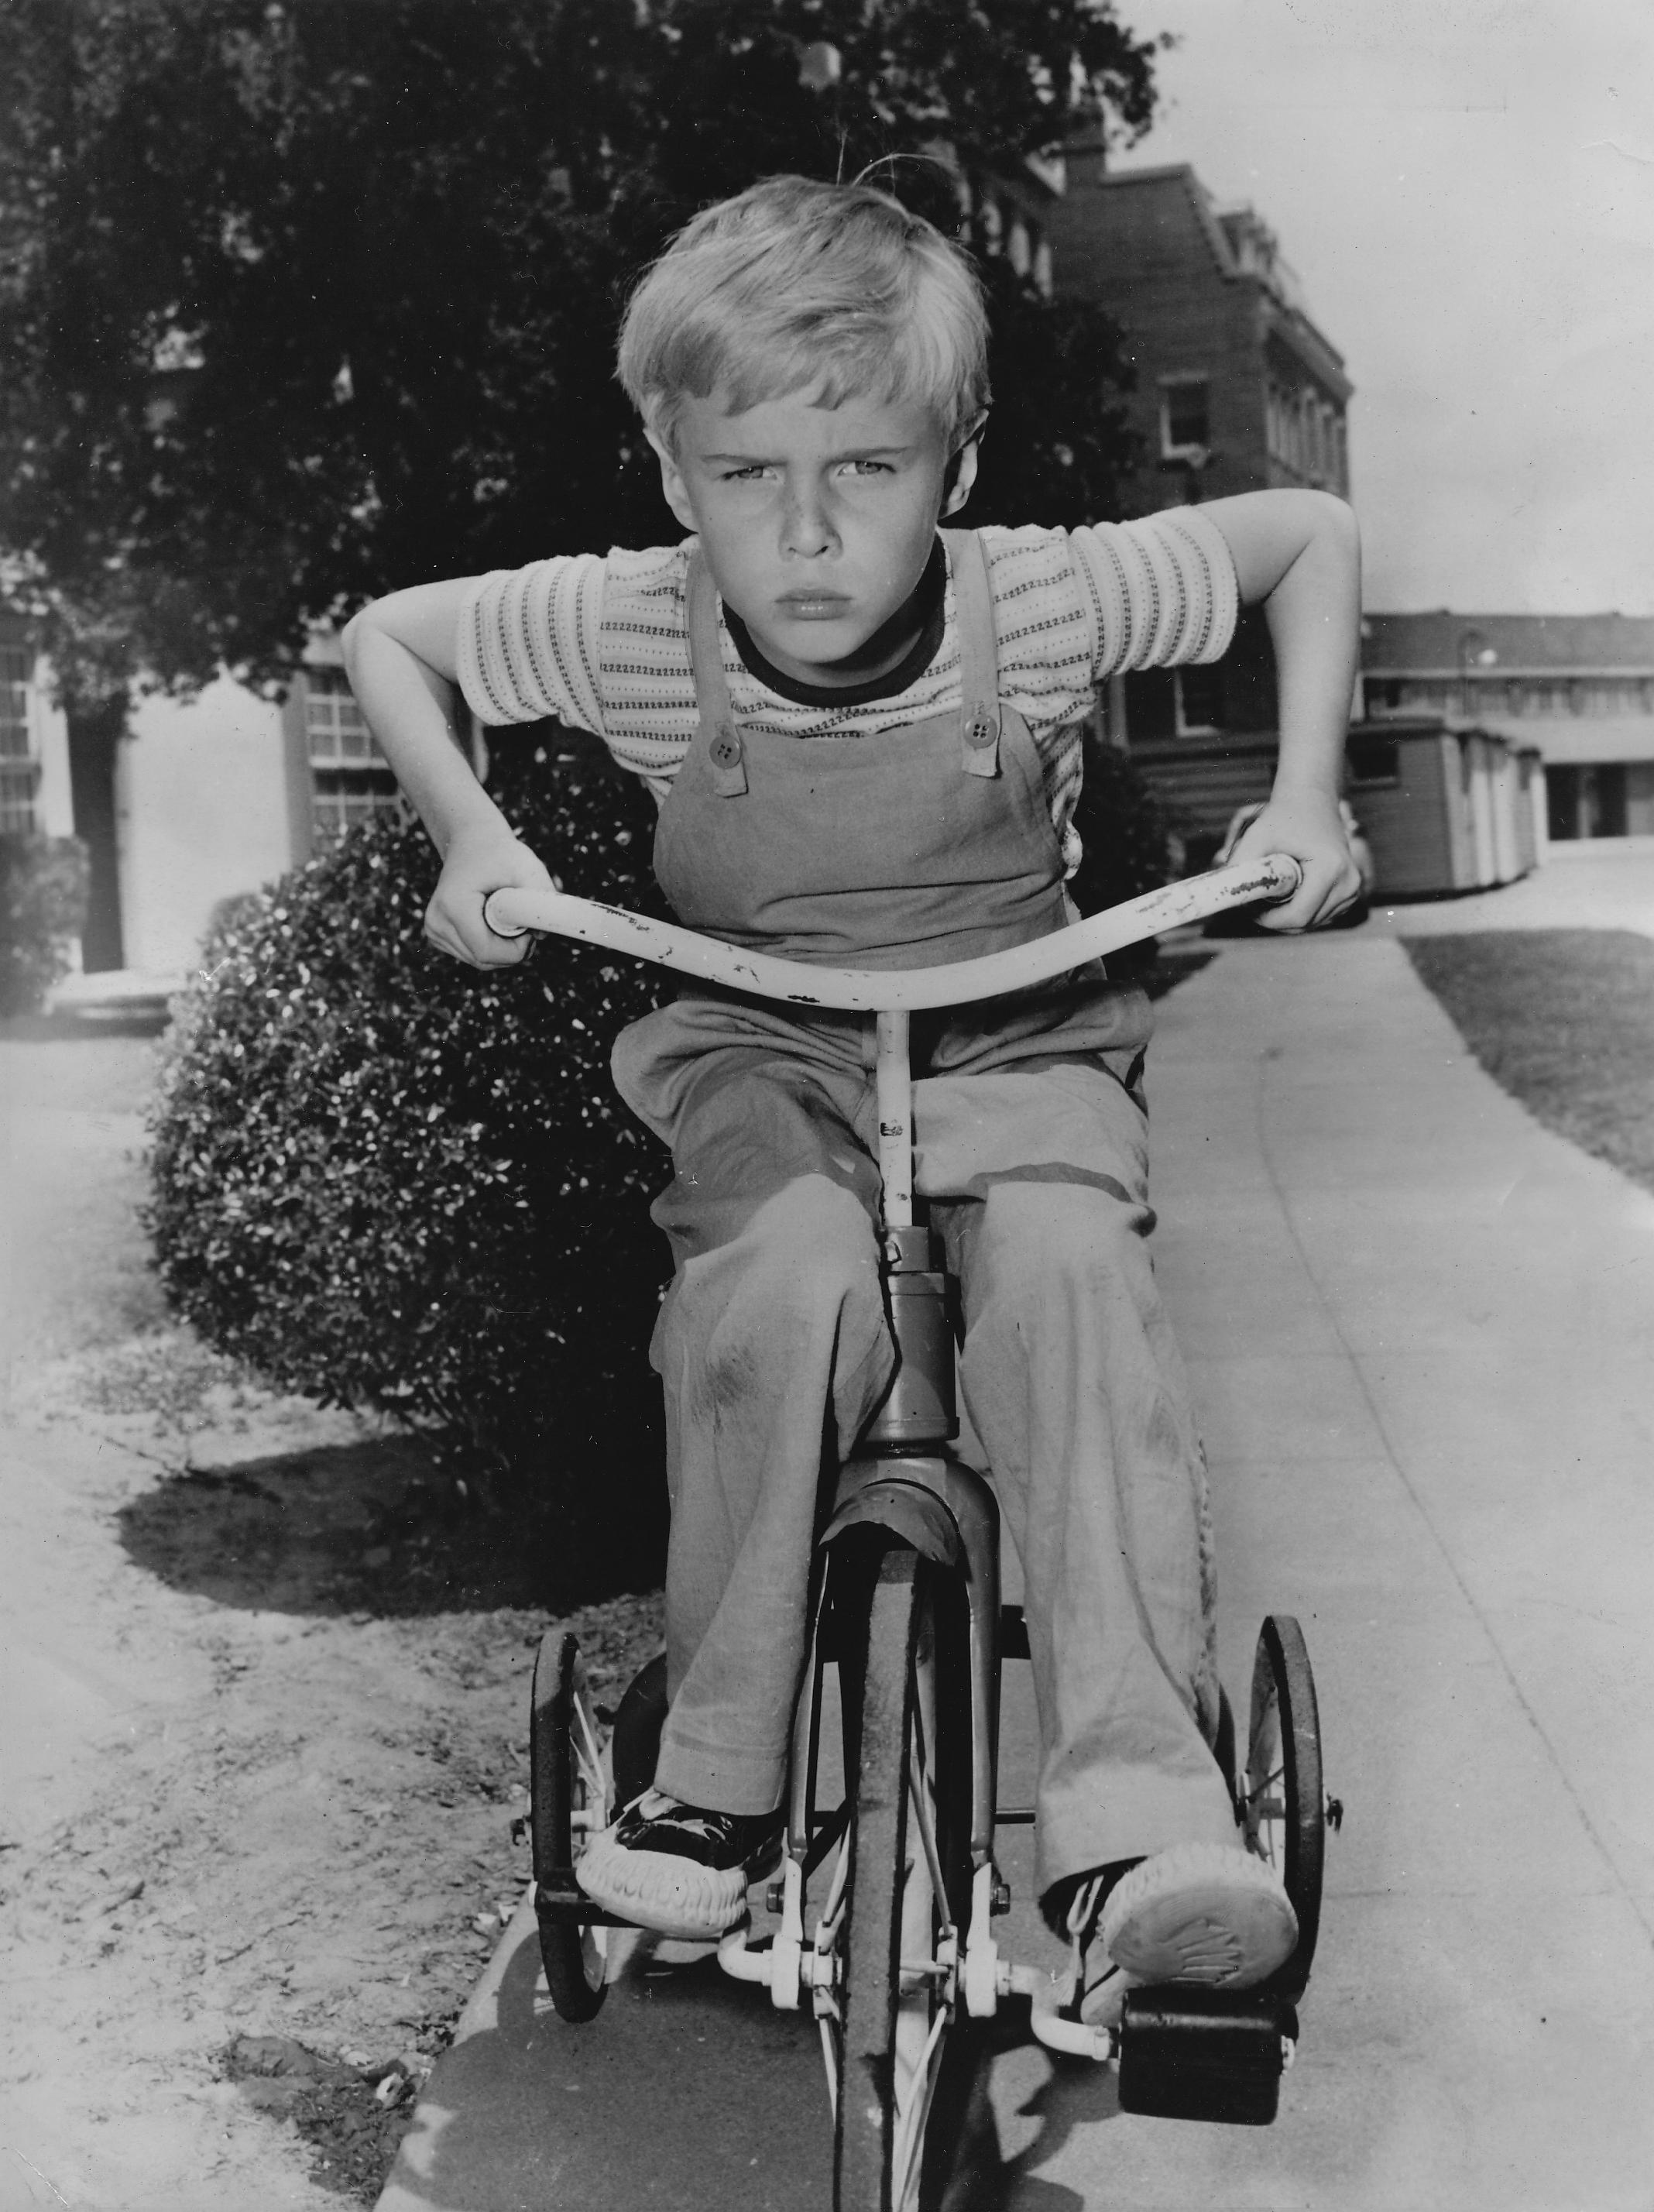 91 Dennis_the_Menace_Jay_North_1959